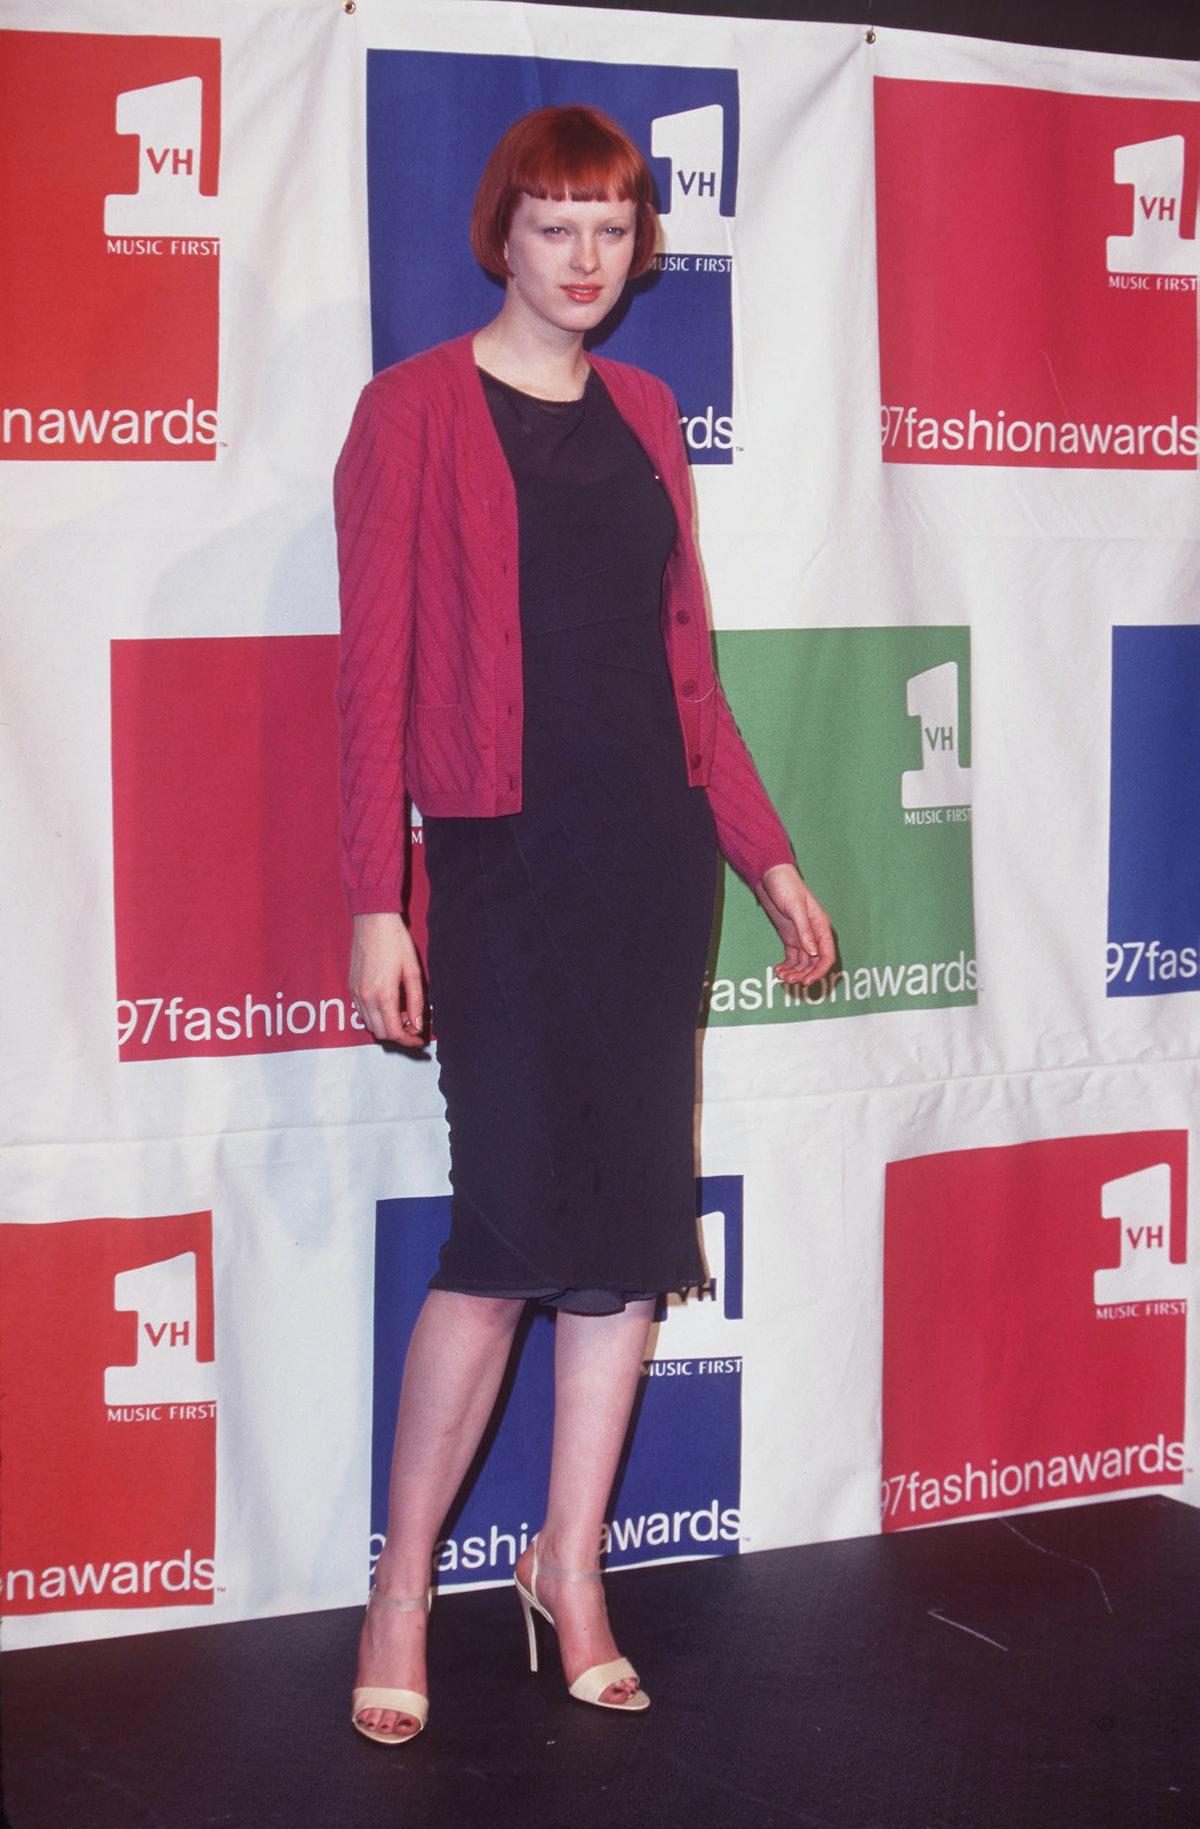 1997 VH1 Vogue Fashion Awards